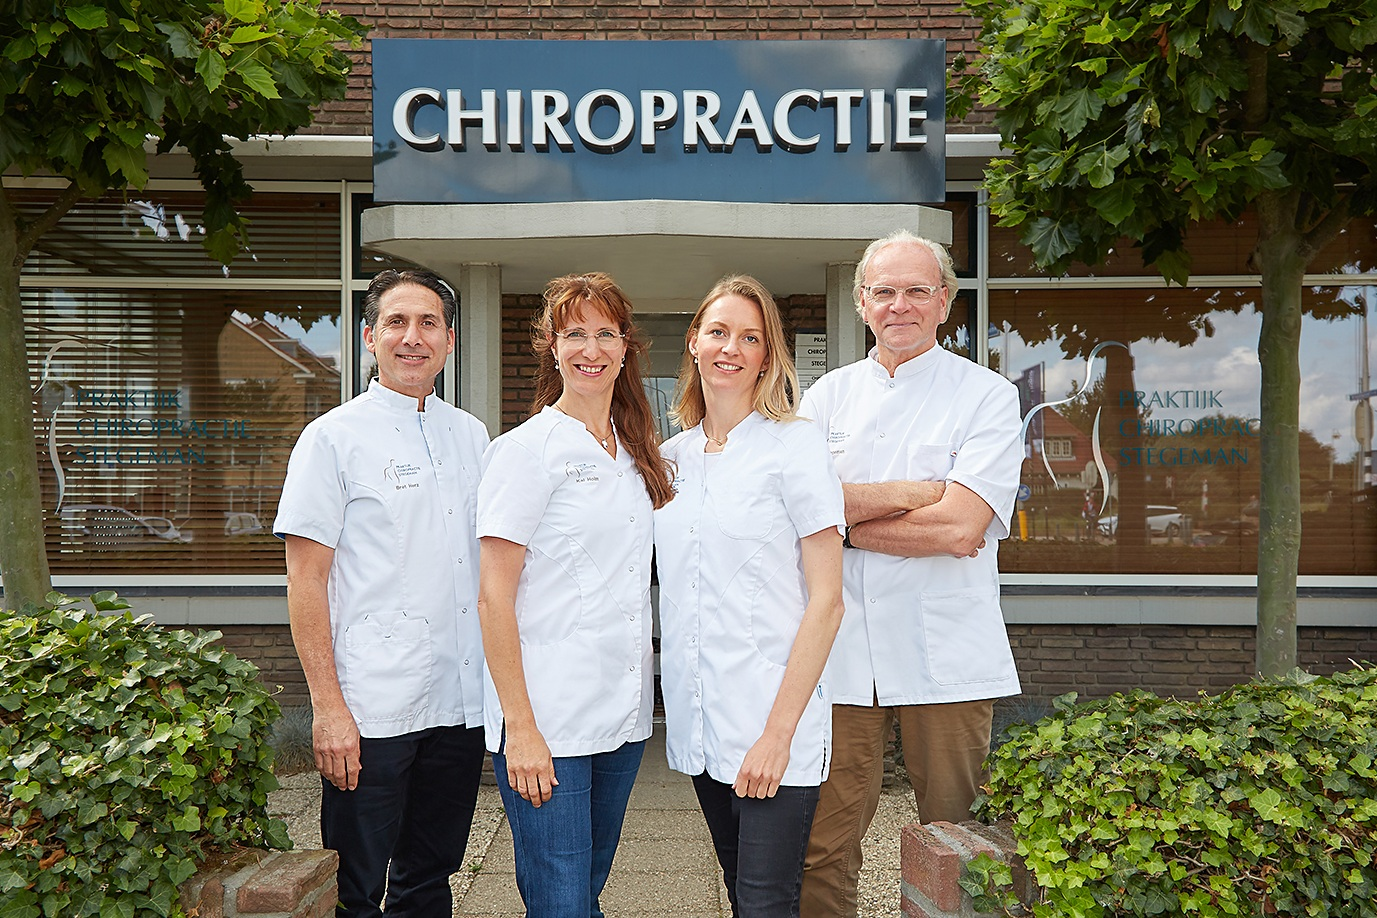 Chiropractie+team+2019-1611_website+banner.jpg